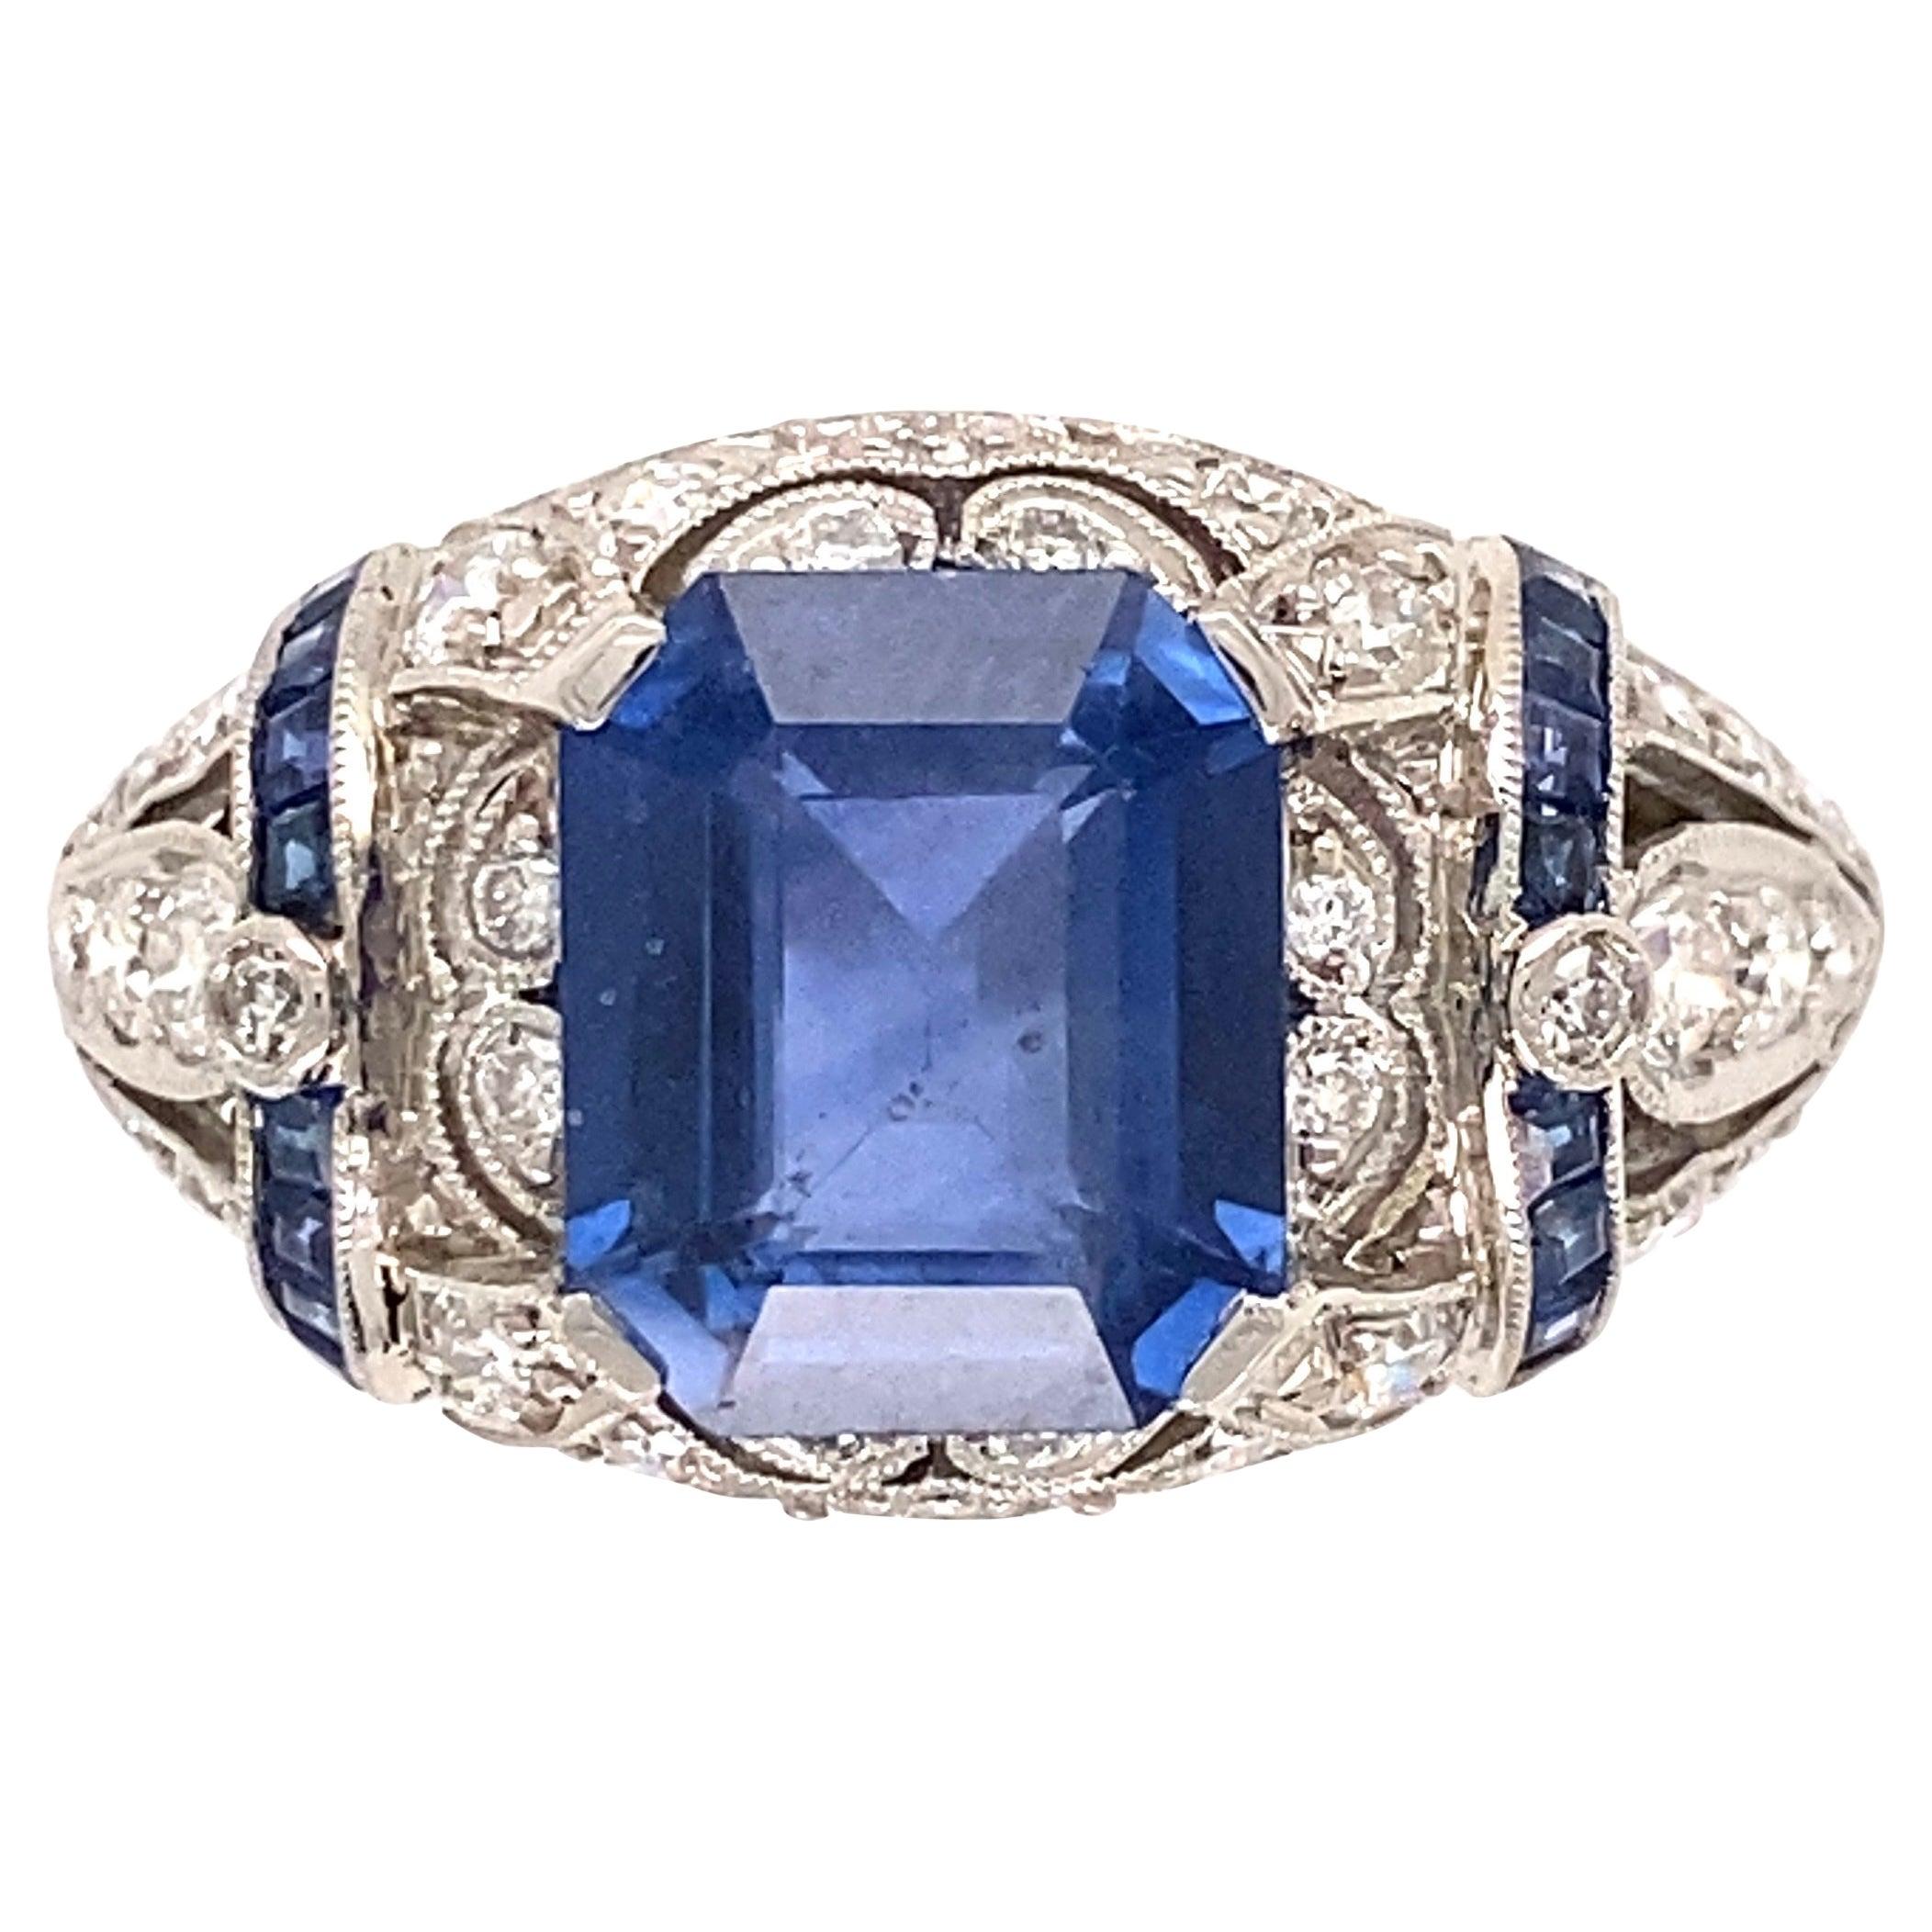 2.87 Carat Emerald Cut Sapphire Diamonds and Sapphires Platinum Ring